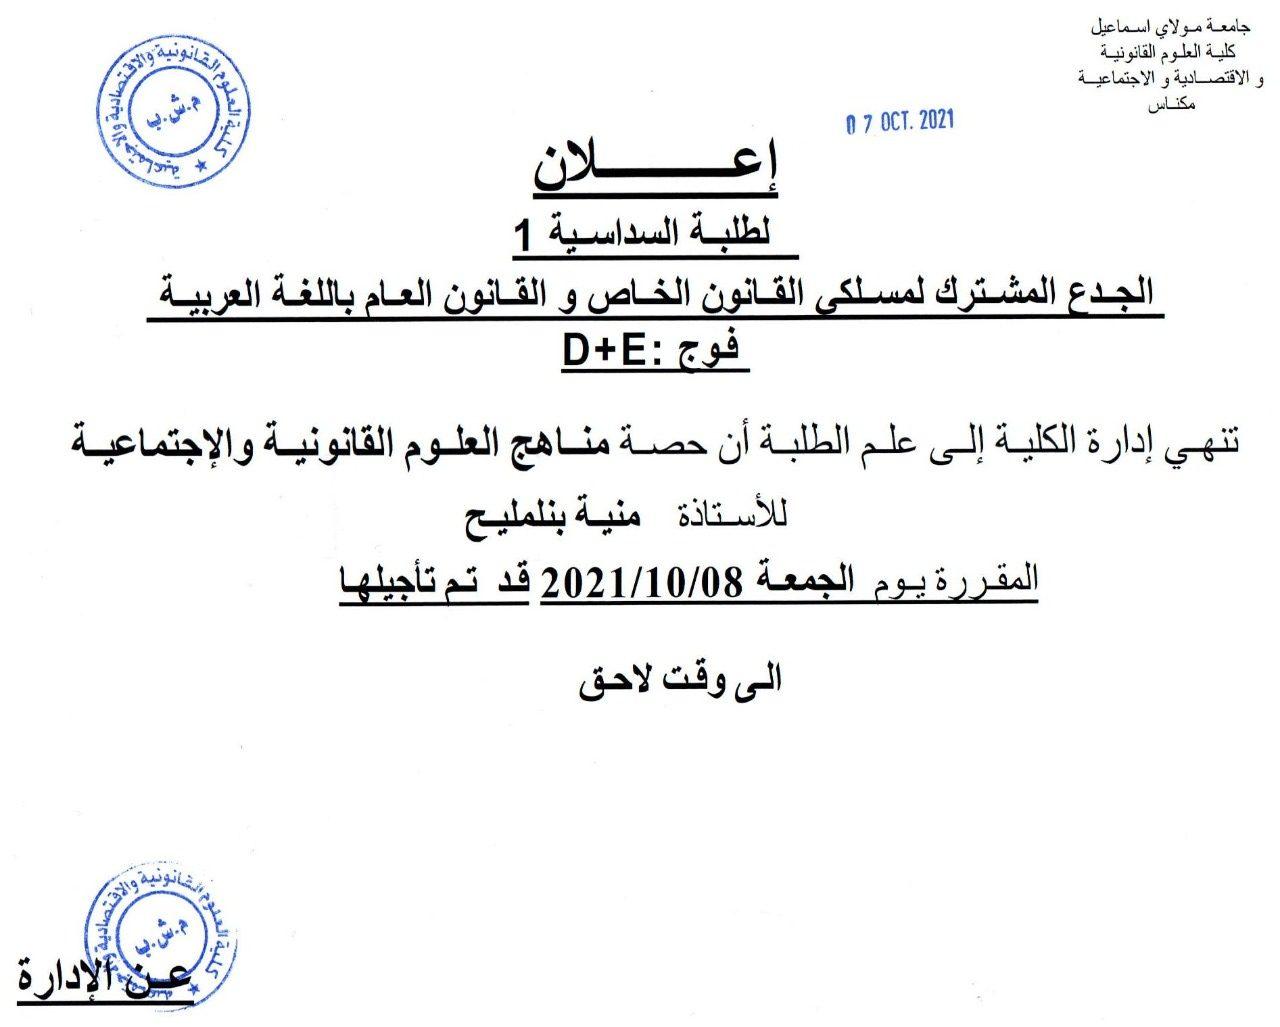 D + E  إعلان لطلبة السداسية الأولى قانون  باللغة العربية : الفوجين